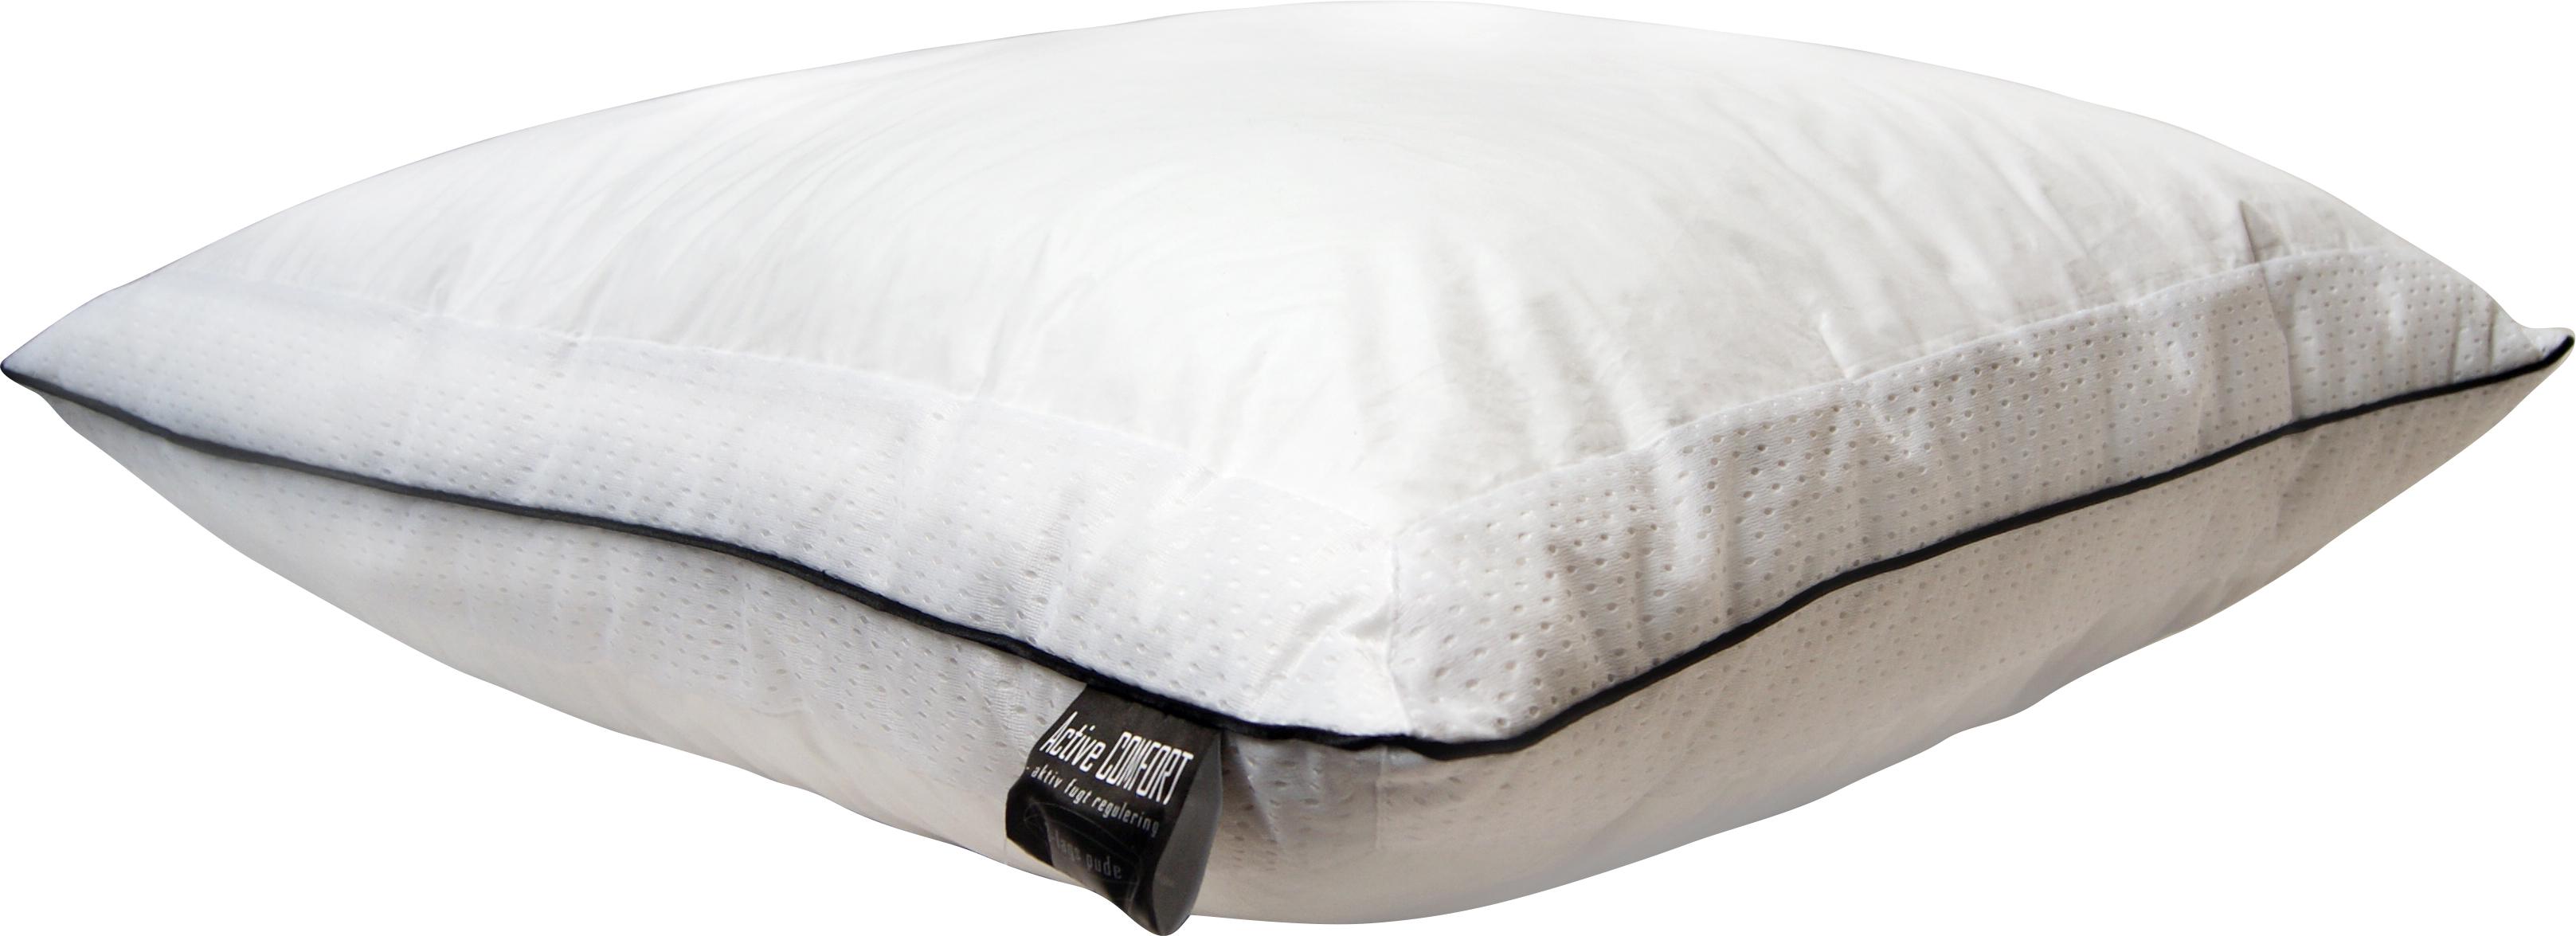 Turiform Active Comfort 3-kammers hovedpude, 60x63 cm